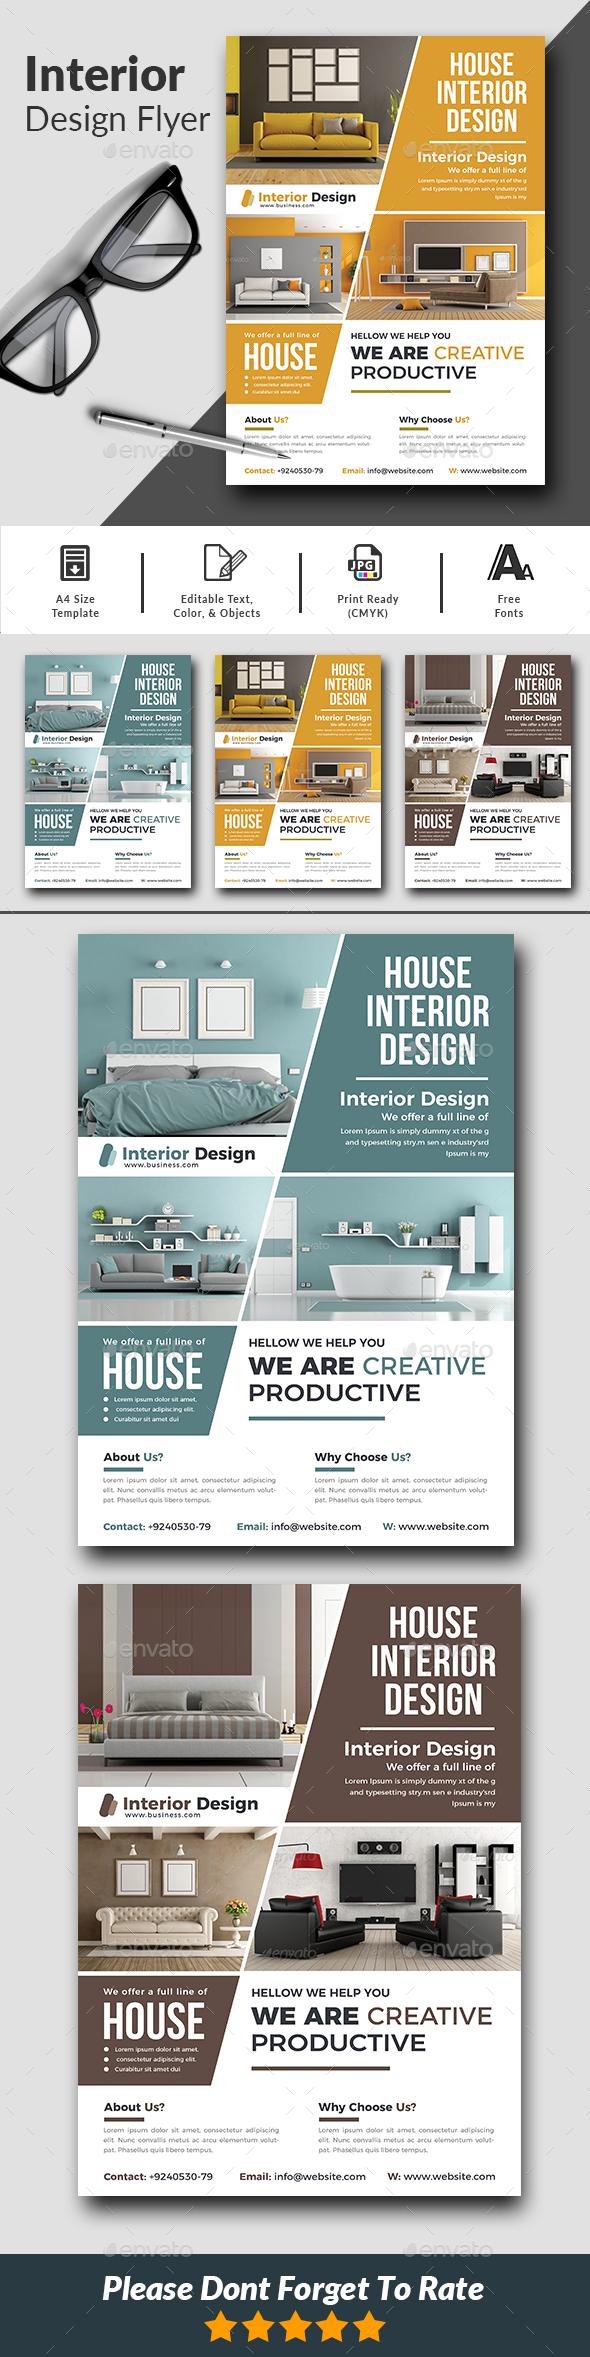 Interior Design Flyer Templates - Corporate Flyers